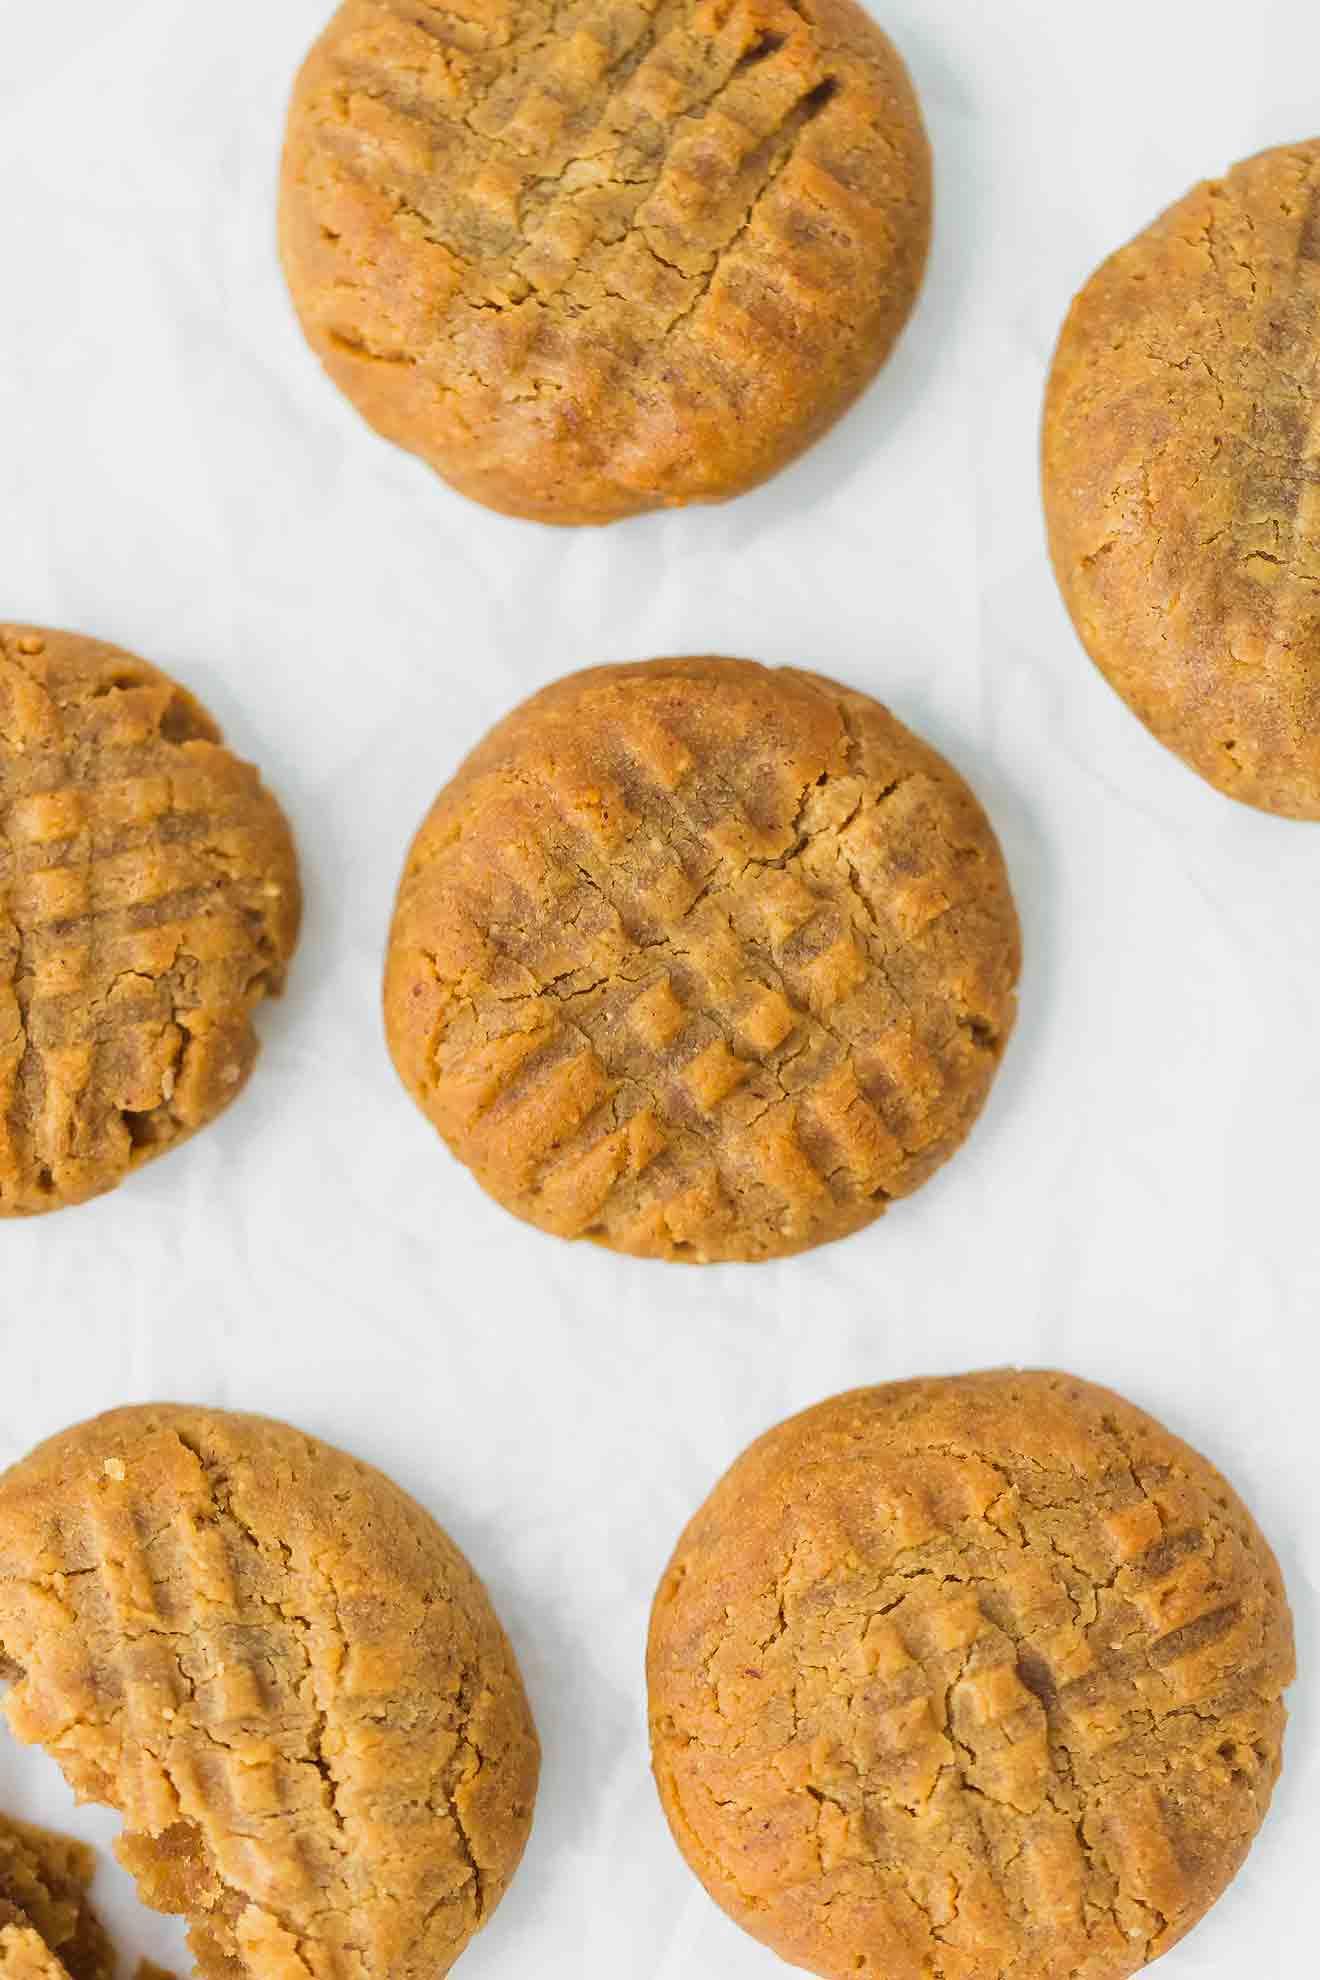 homemade peanut butter keto diet